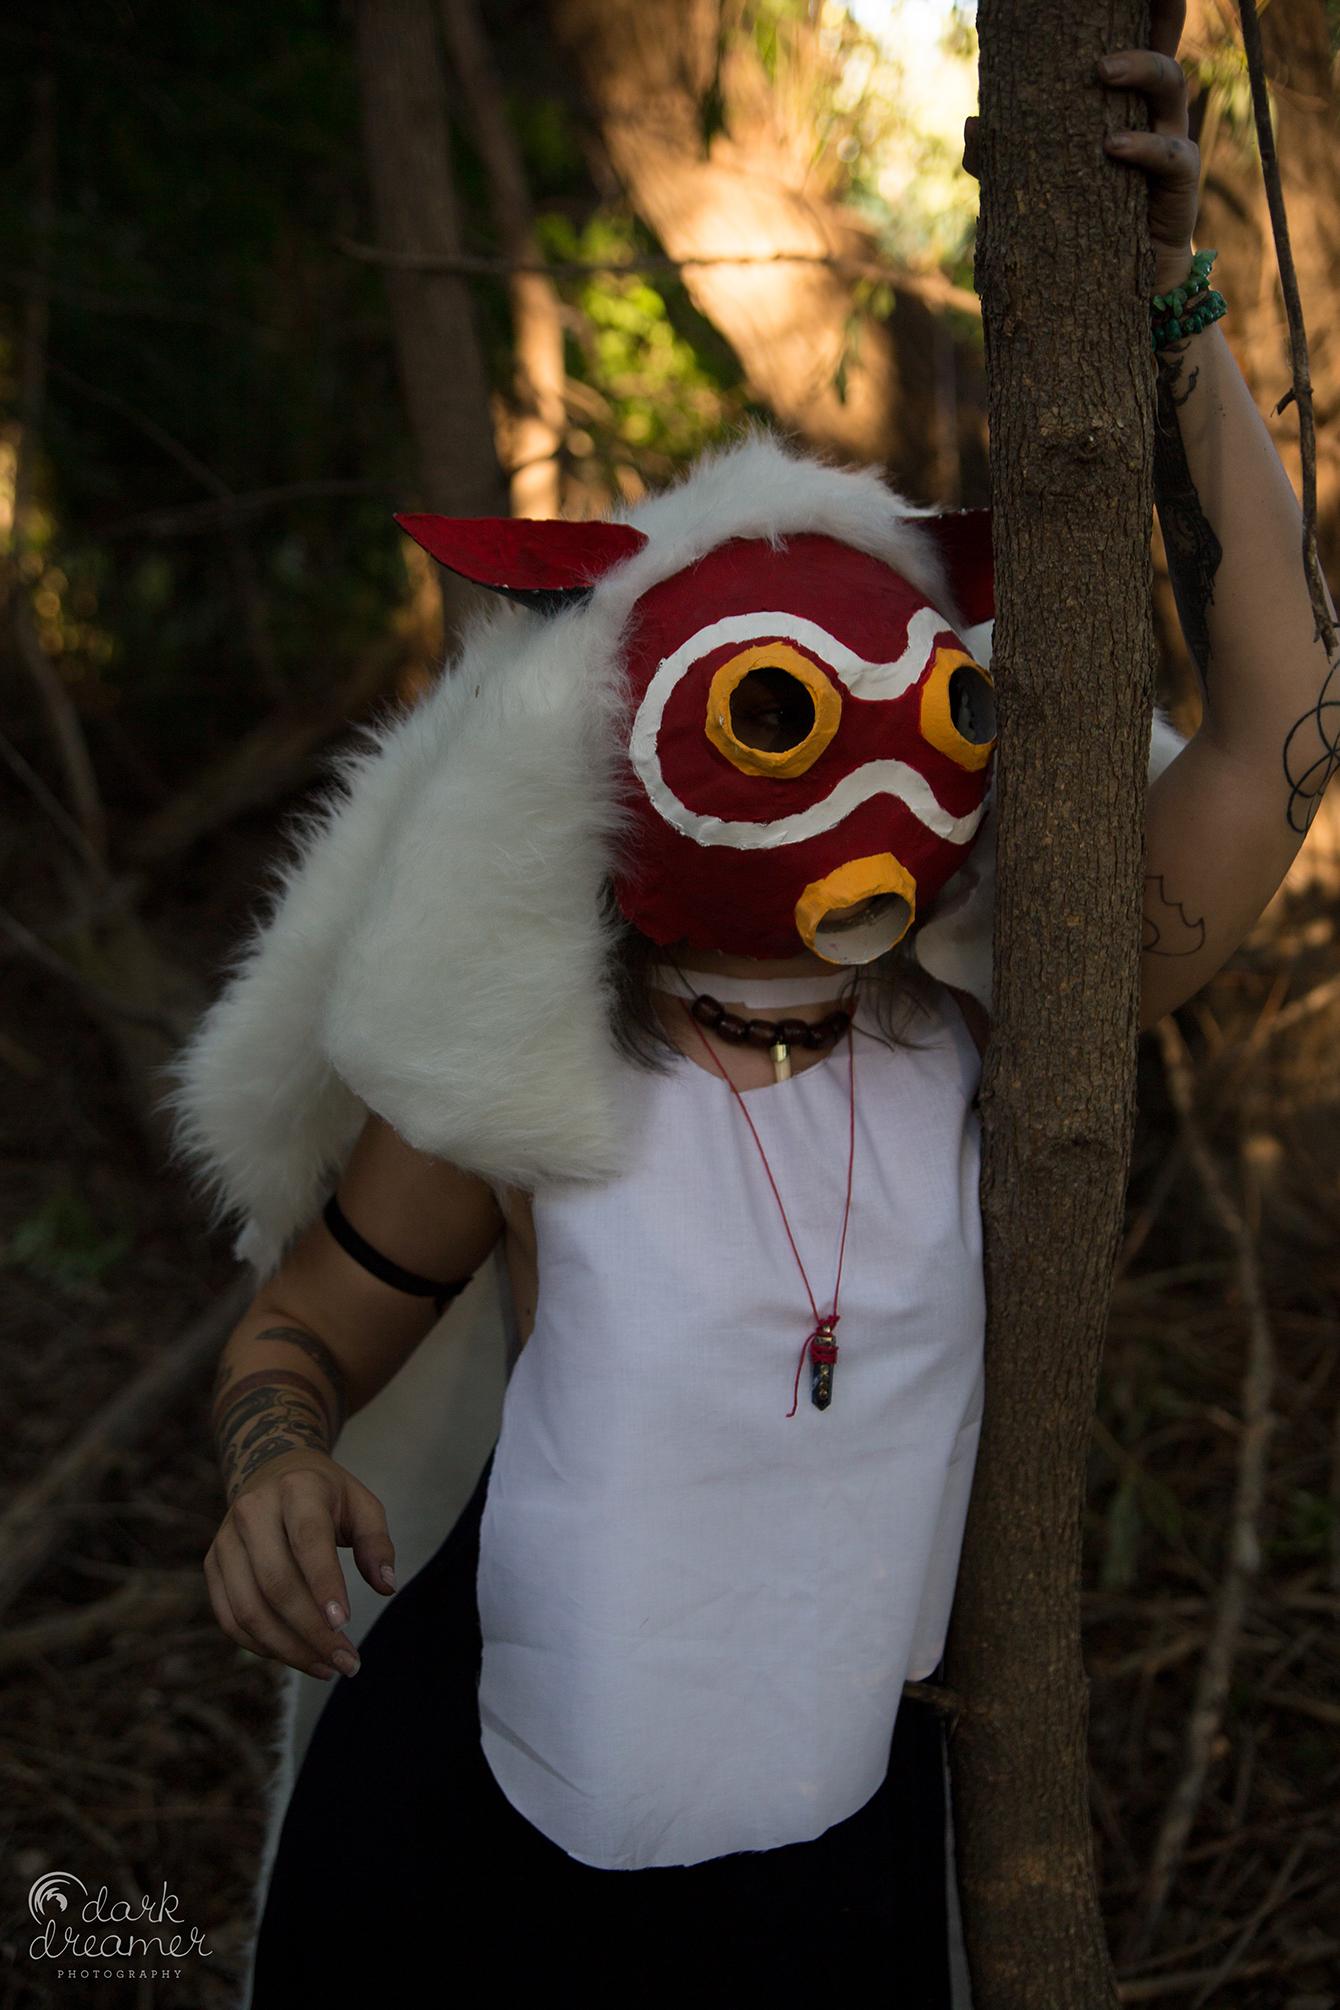 Princess Mononoke Cosplay Photoshoot Dark Dreamer Photography